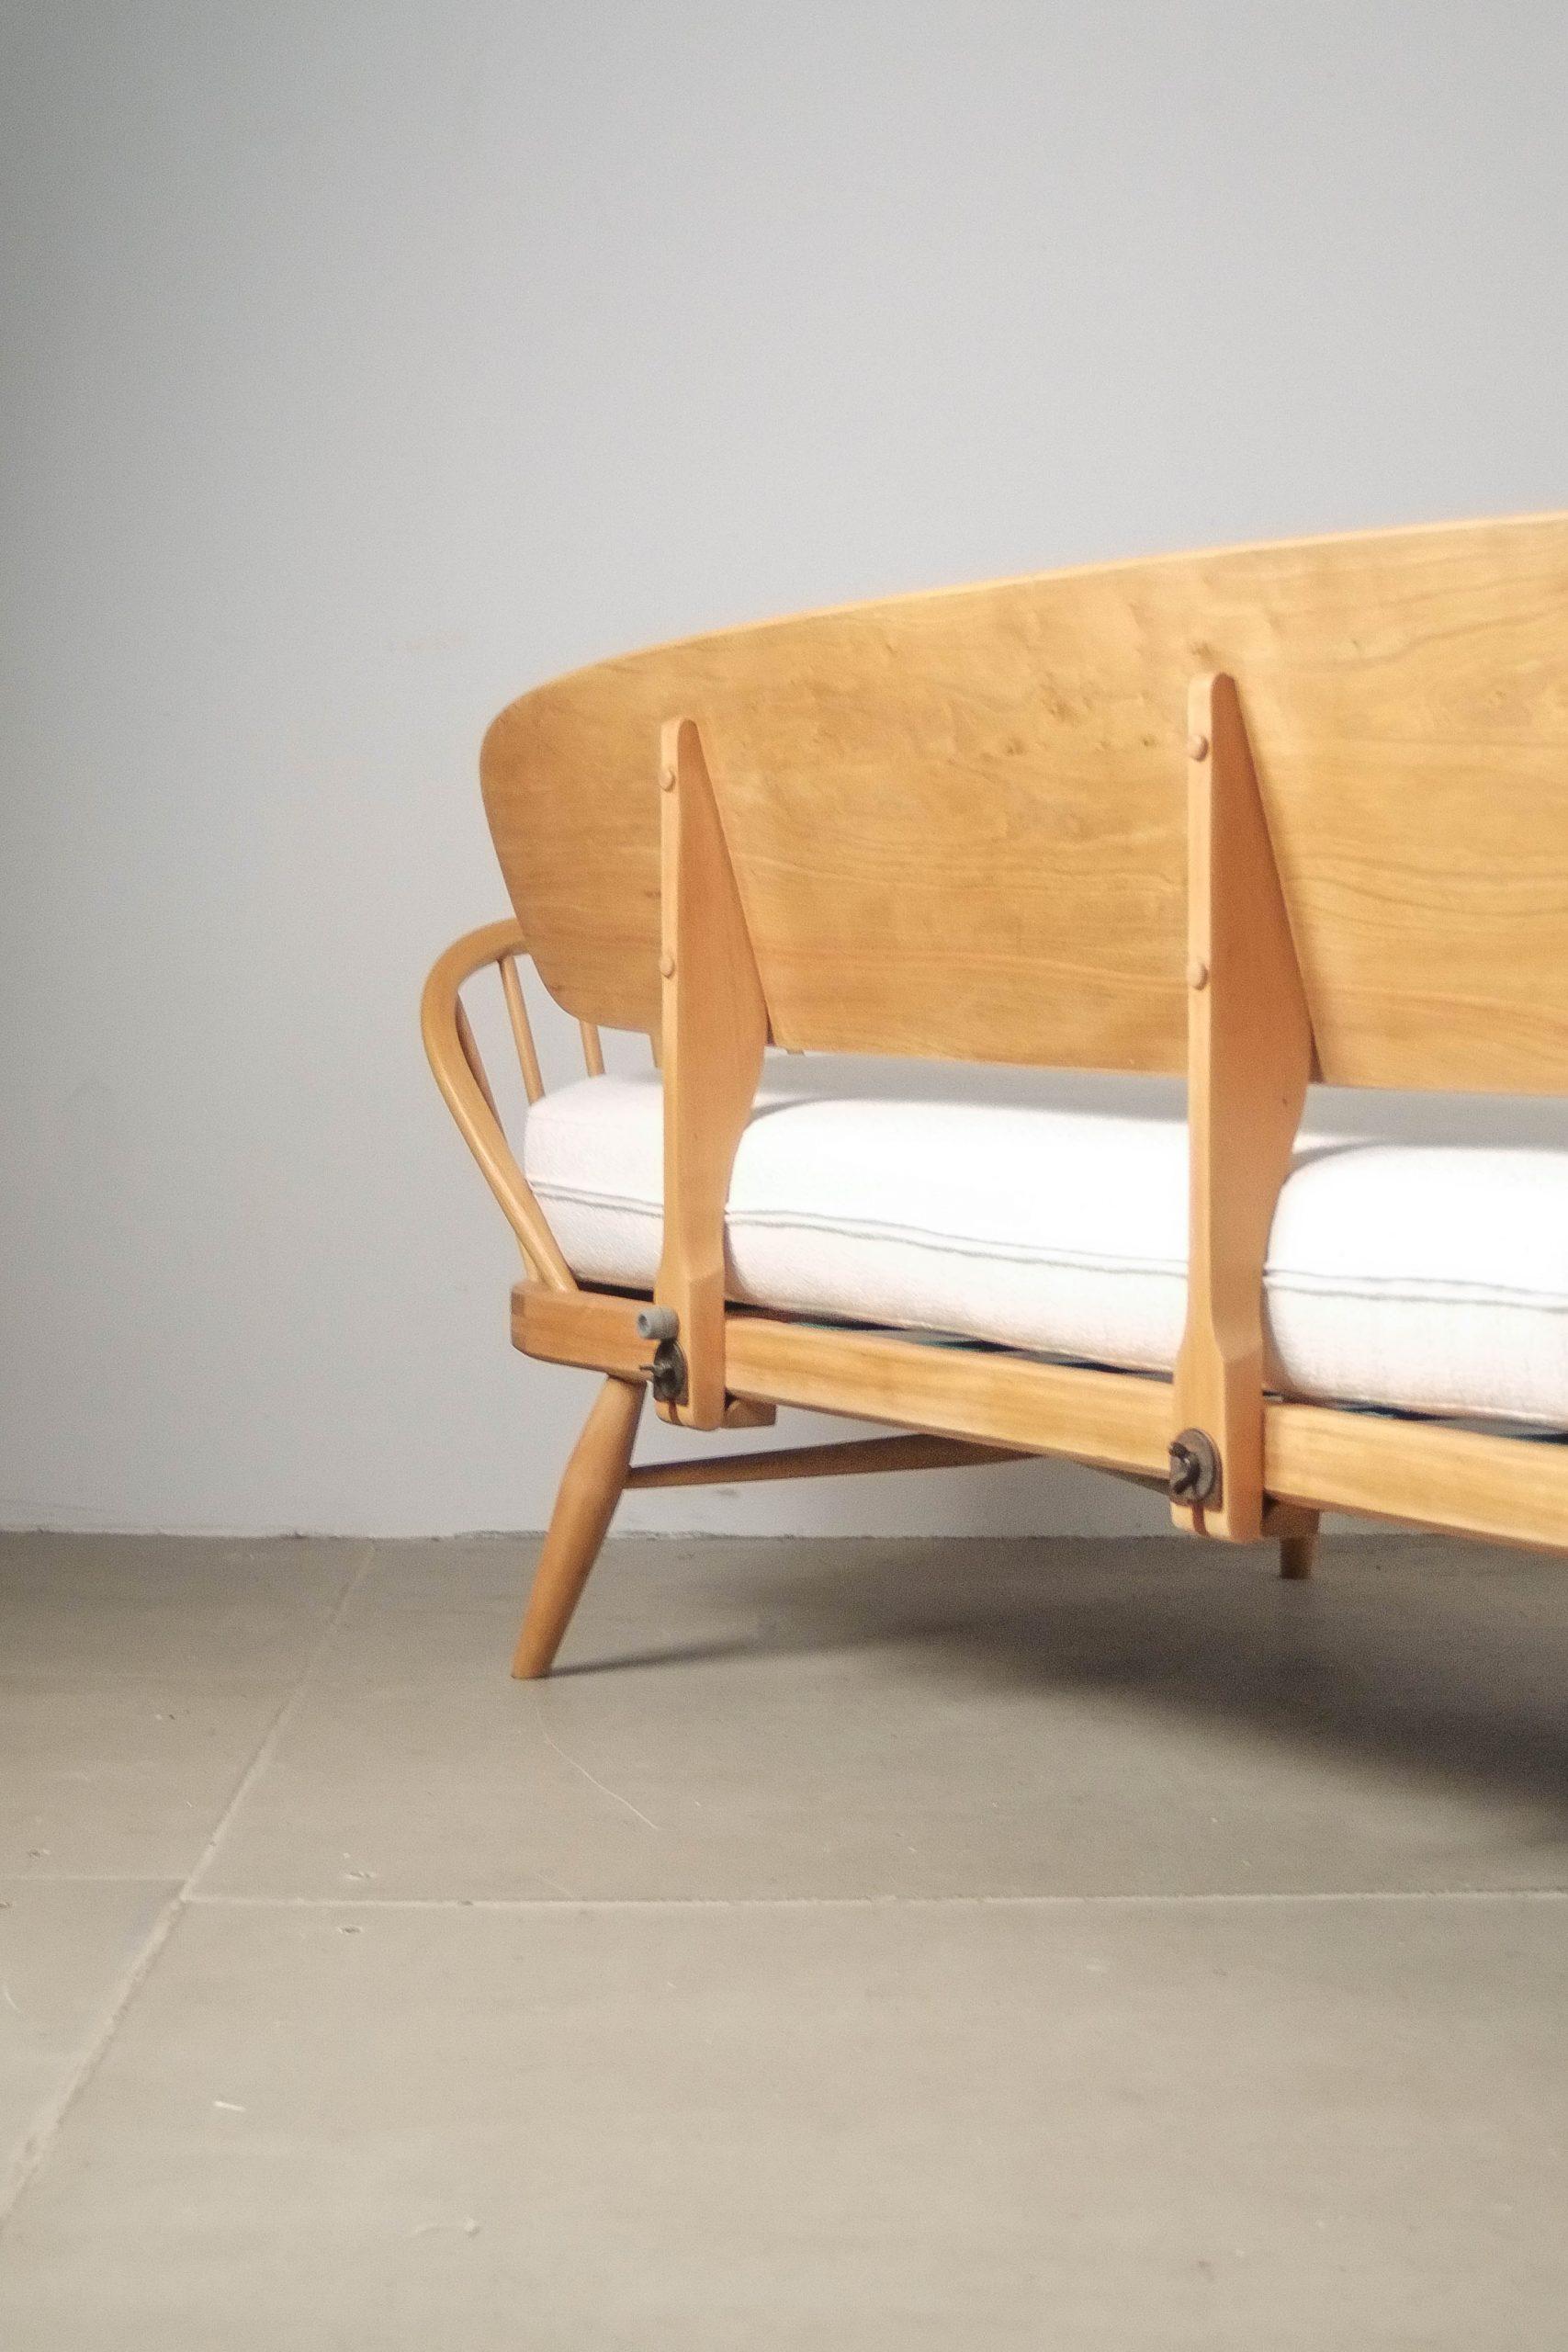 sofa de madera maciza de diseño studio estudio blanco tapizado